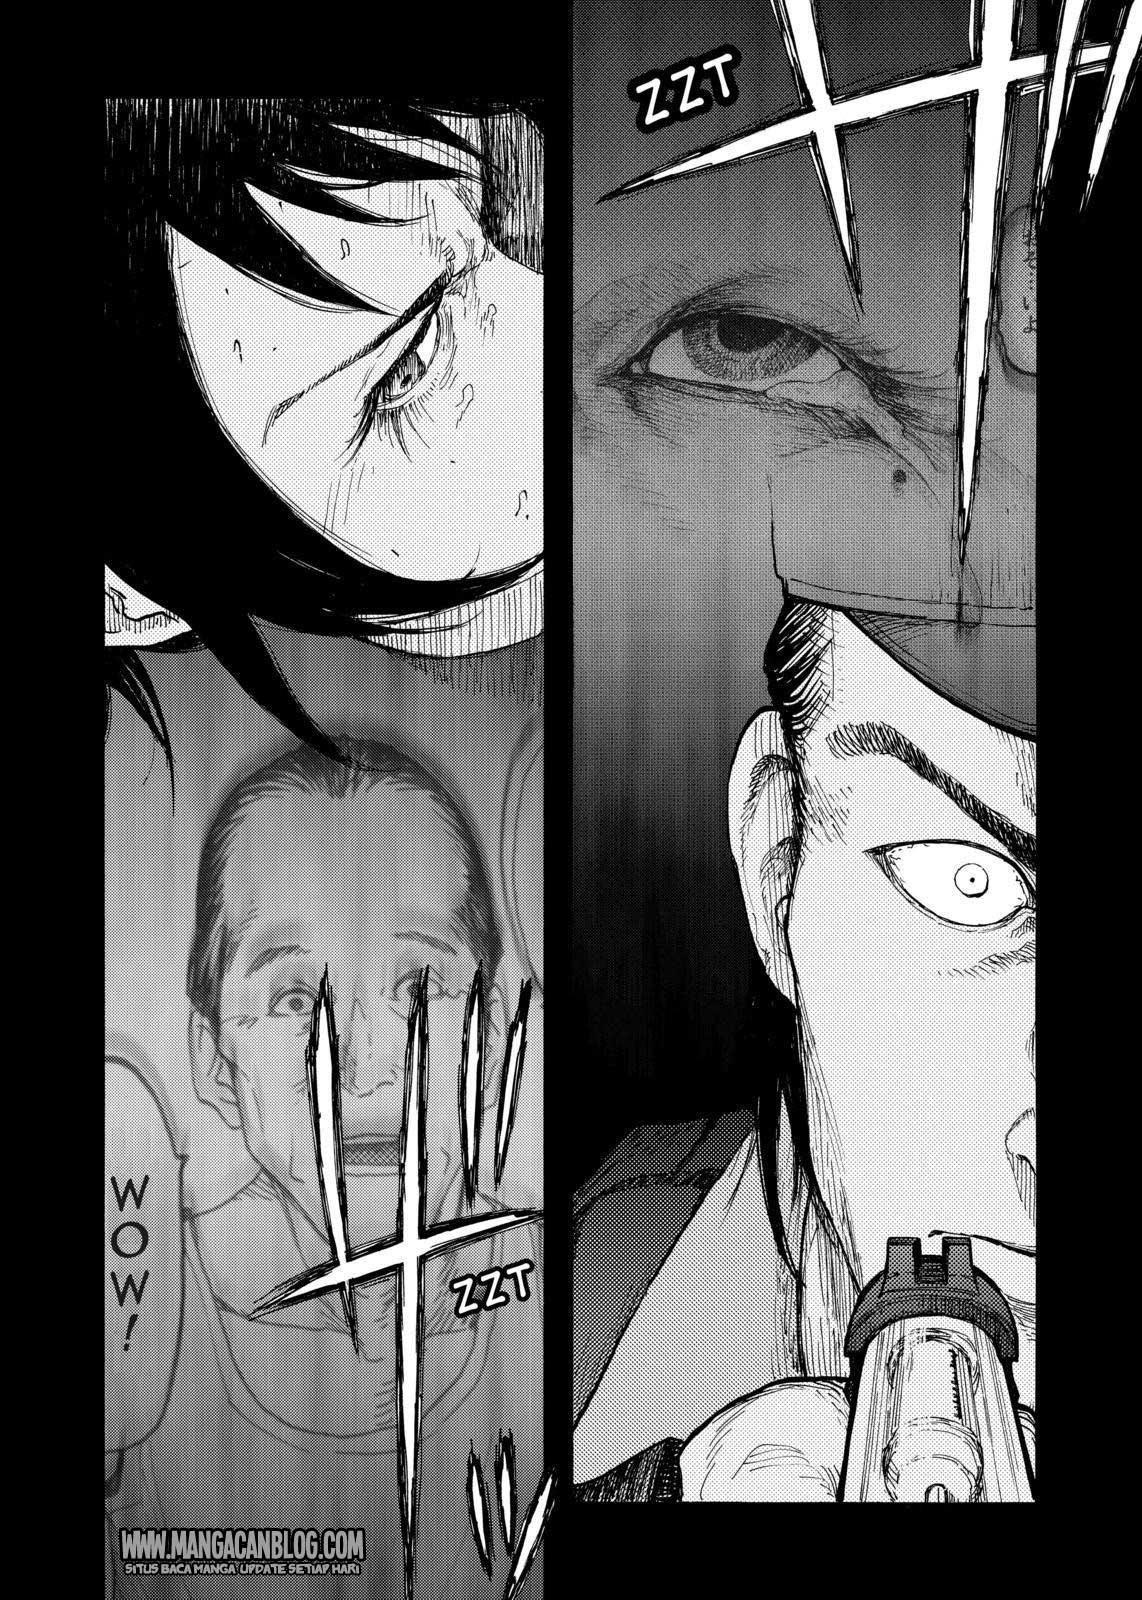 Dilarang COPAS - situs resmi www.mangacanblog.com - Komik ajin 039 - garis keras medan pertempuran 2 40 Indonesia ajin 039 - garis keras medan pertempuran 2 Terbaru 15|Baca Manga Komik Indonesia|Mangacan